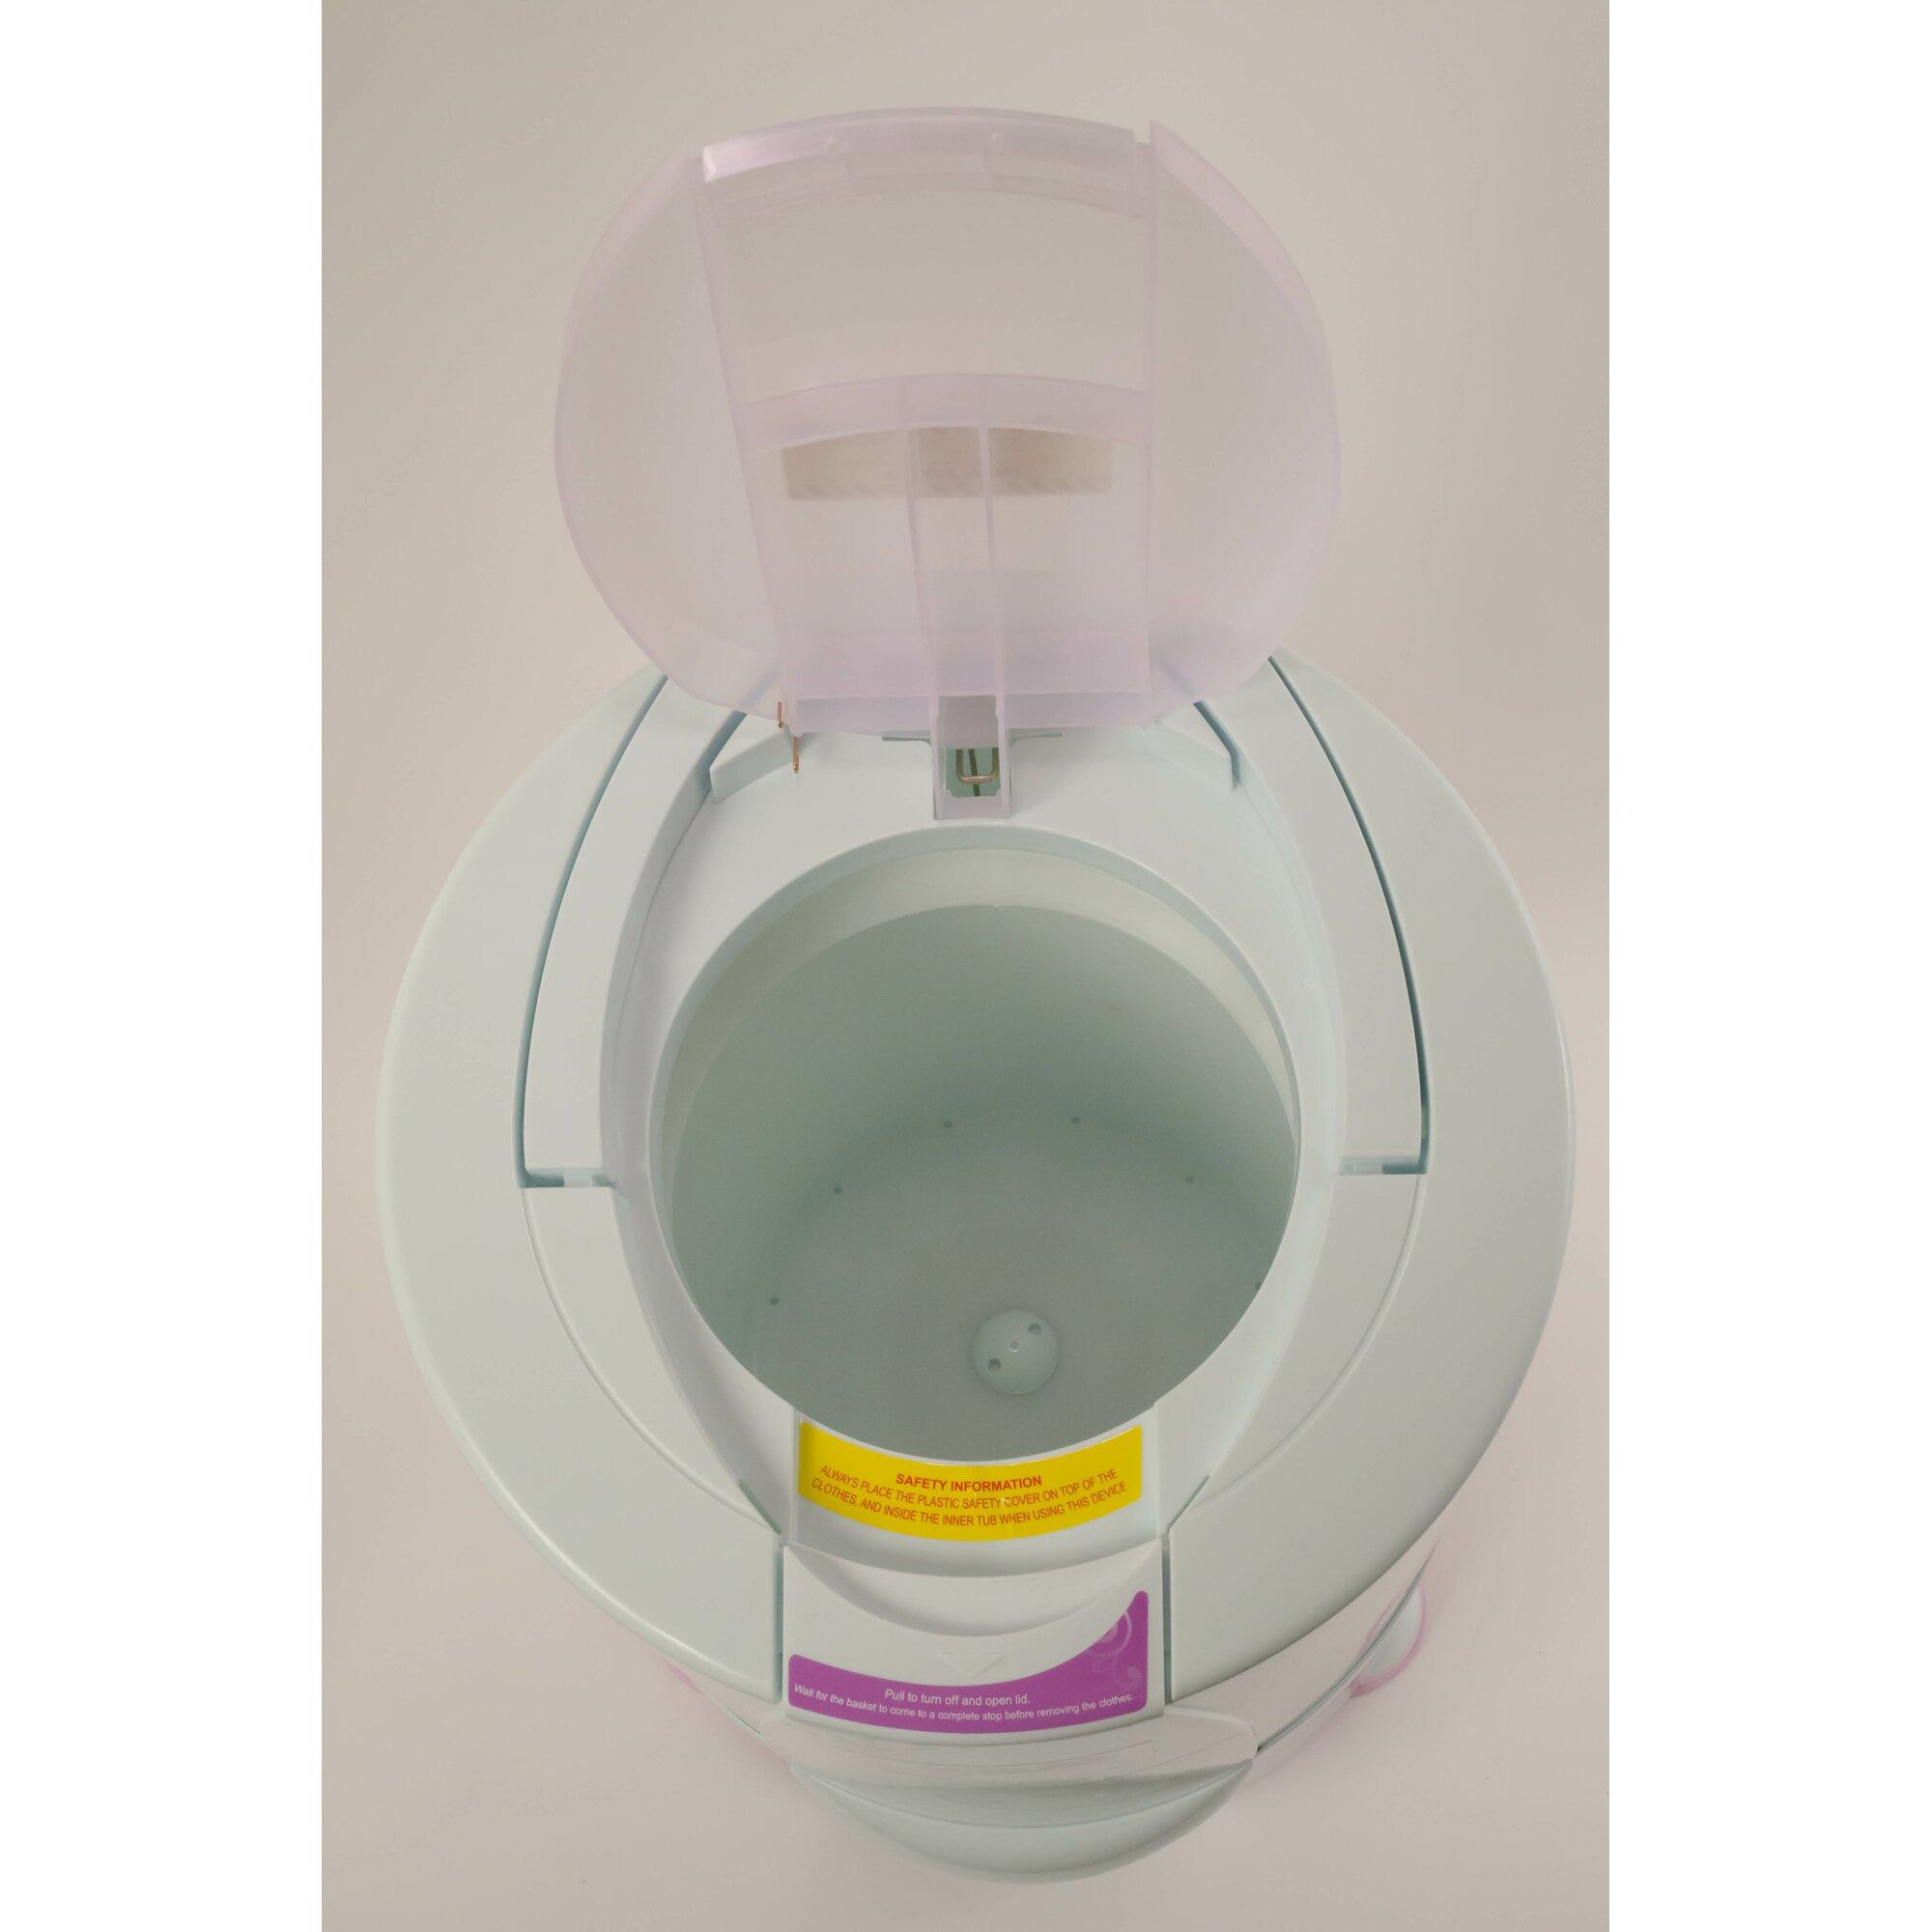 The Laundry Alternative Portable Energy Saving Dryer